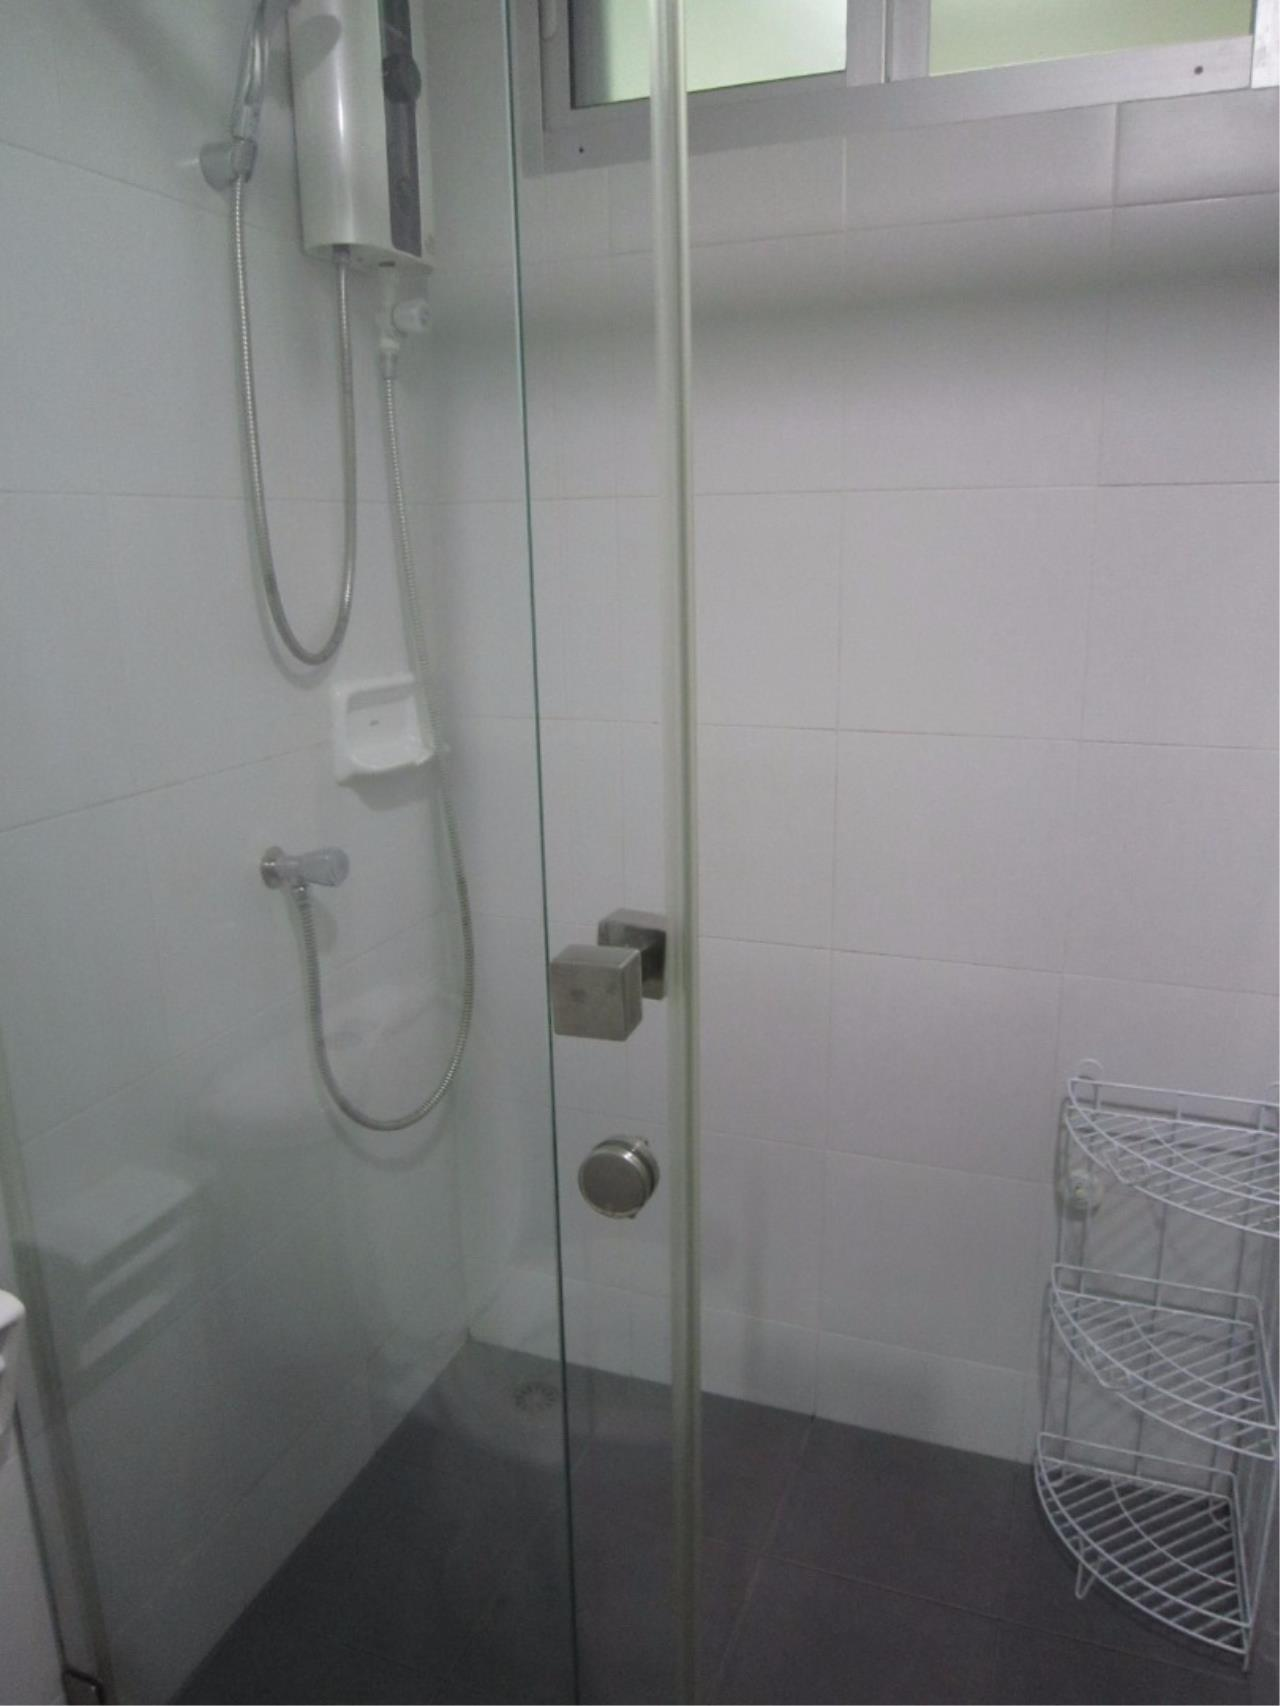 Quality Life Property Agency's S A L E! My Condo Sukhumvit 52 | 1 BED 1 BATH | 35.4 SQ. M. 8